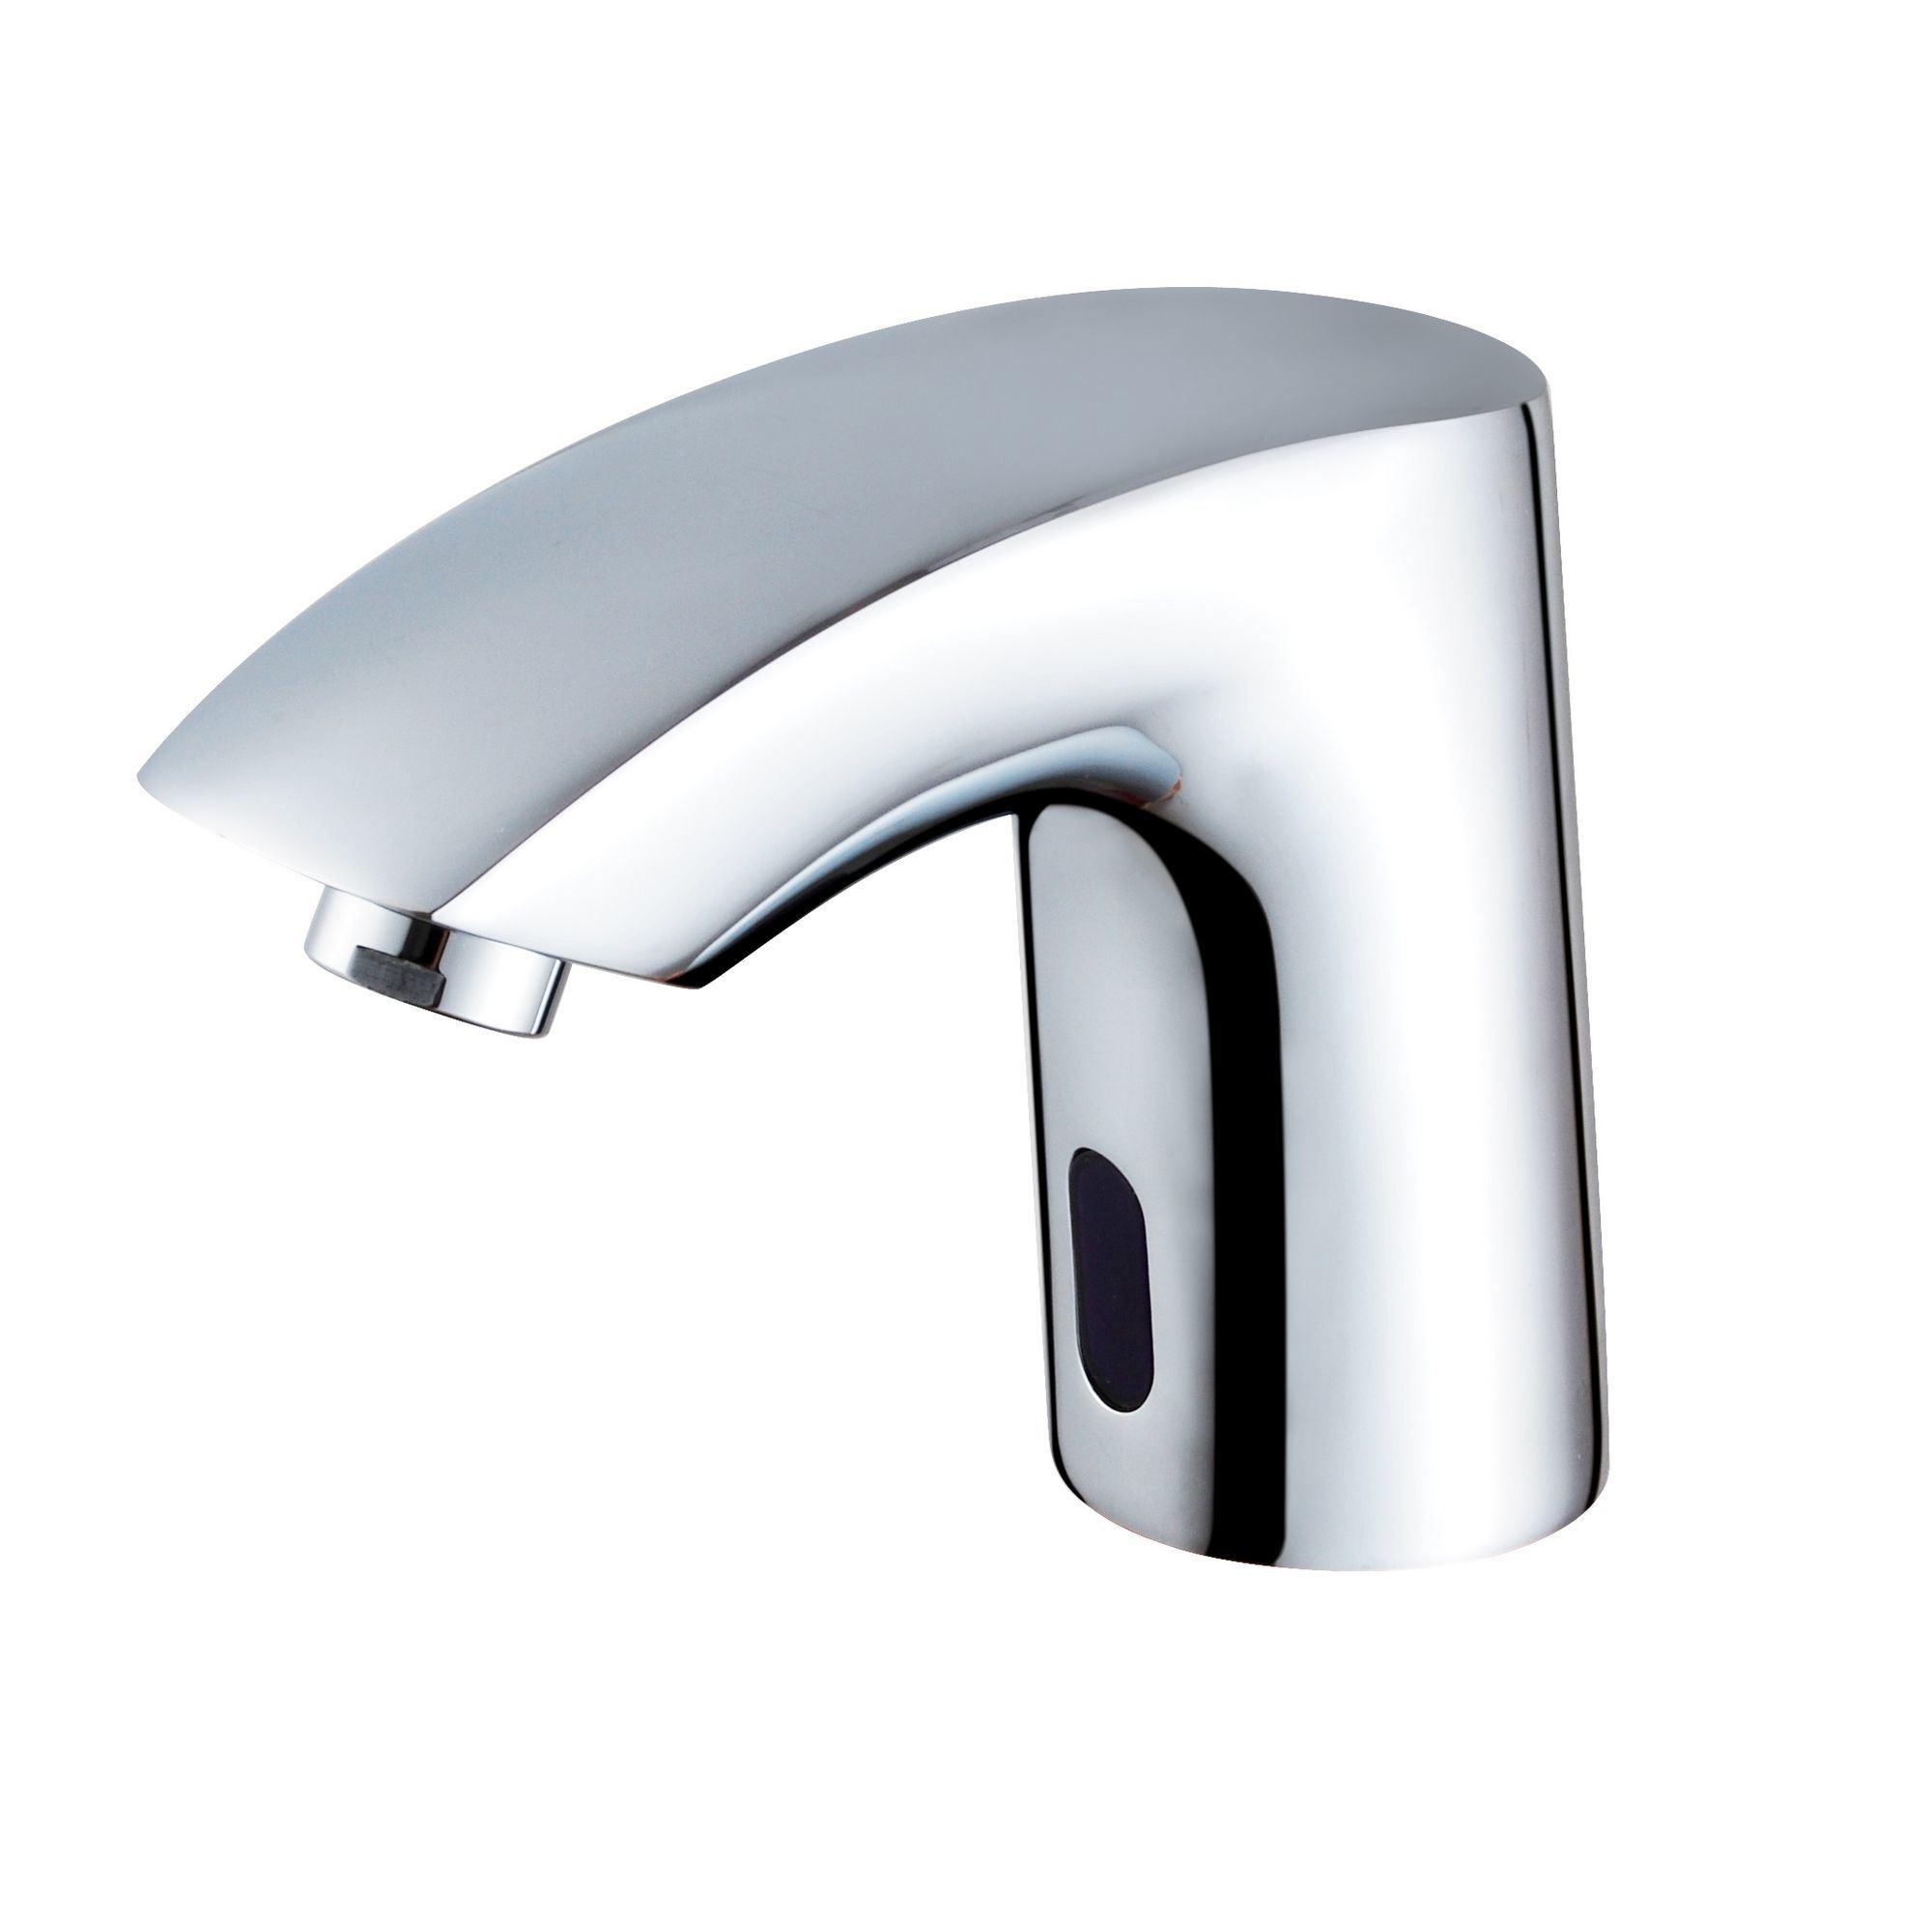 Sensor Faucet (713) - China Sensor Faucet, Automatic Faucet